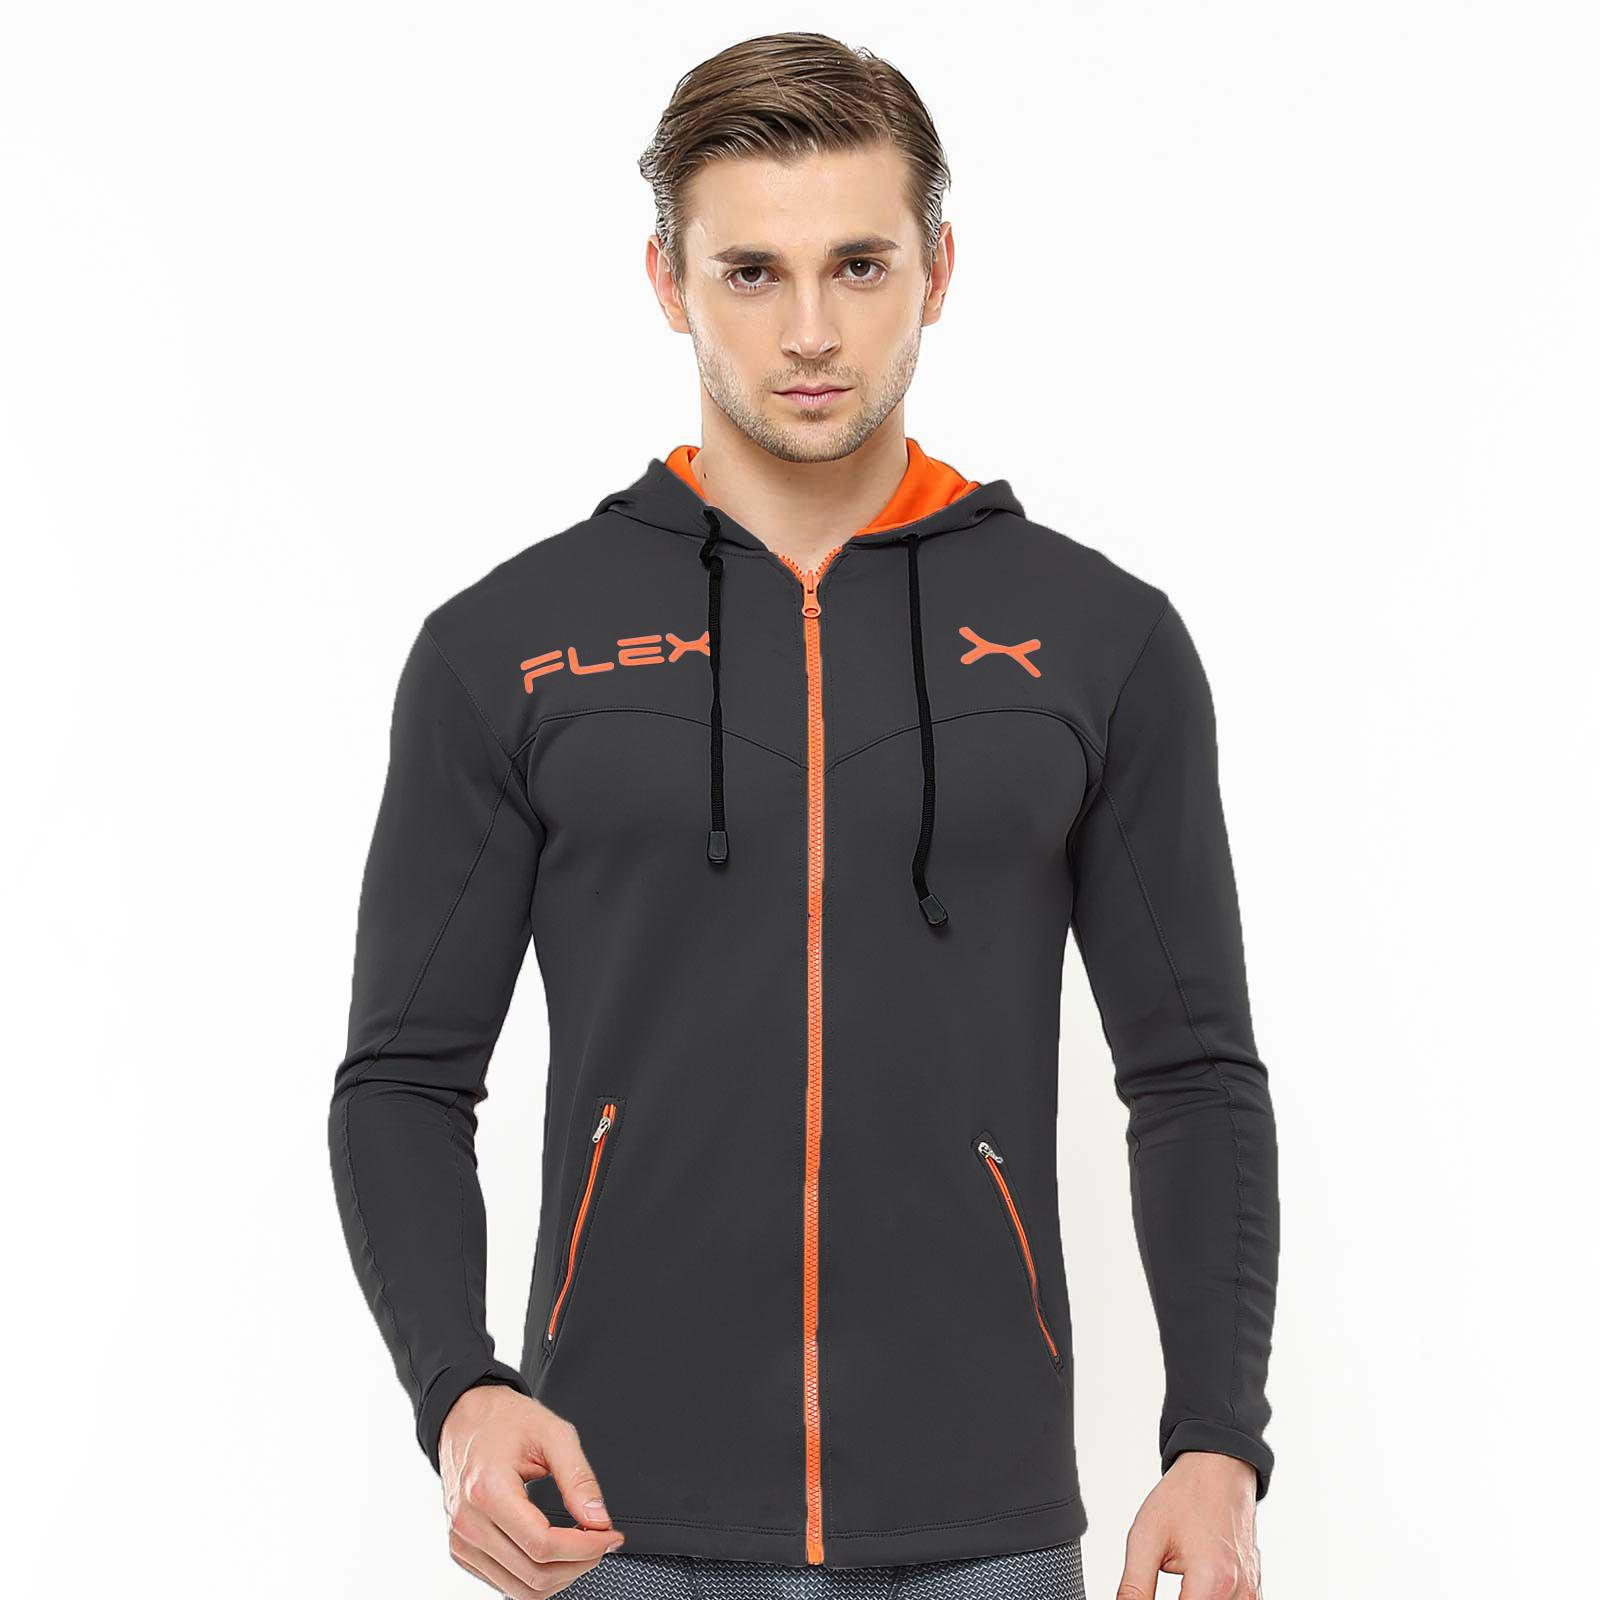 Jaket Olahraga Hoodie FJS-002 Durable Sport Intensive  Gym Fitness Jogging Lari baa44eab08